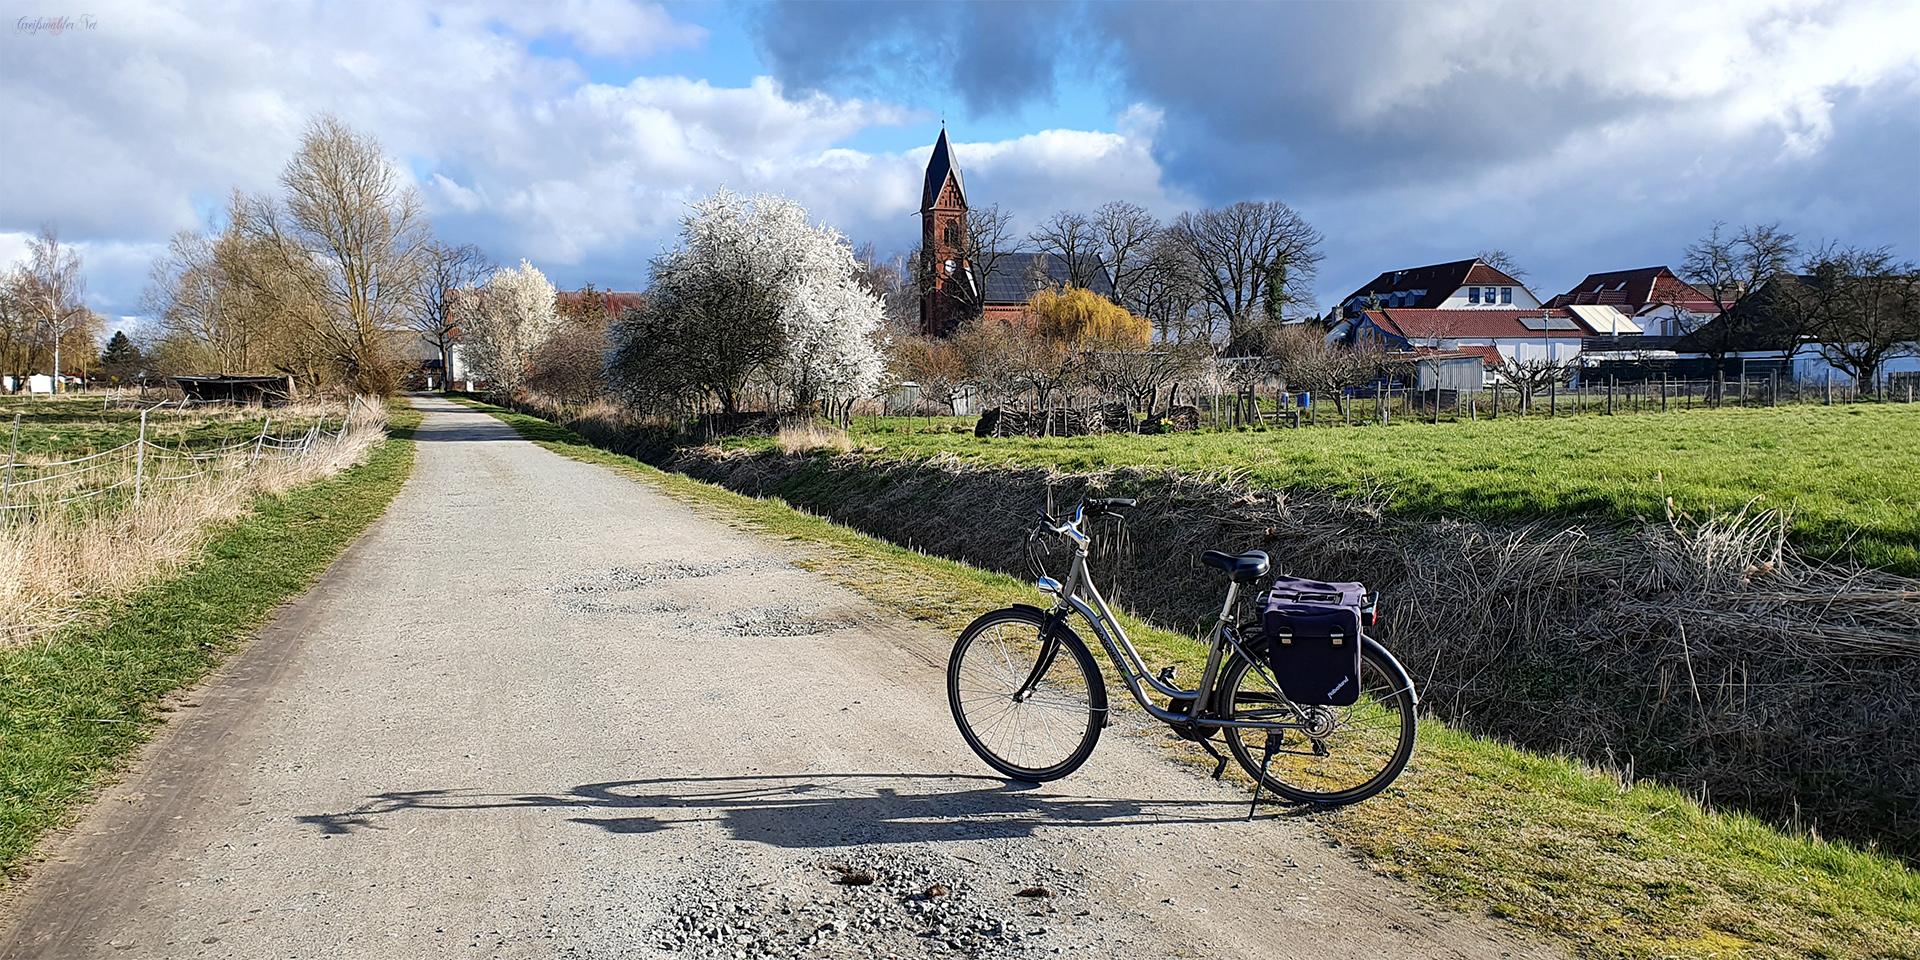 Sonntag an der Kirche in Greifswald-Wieck